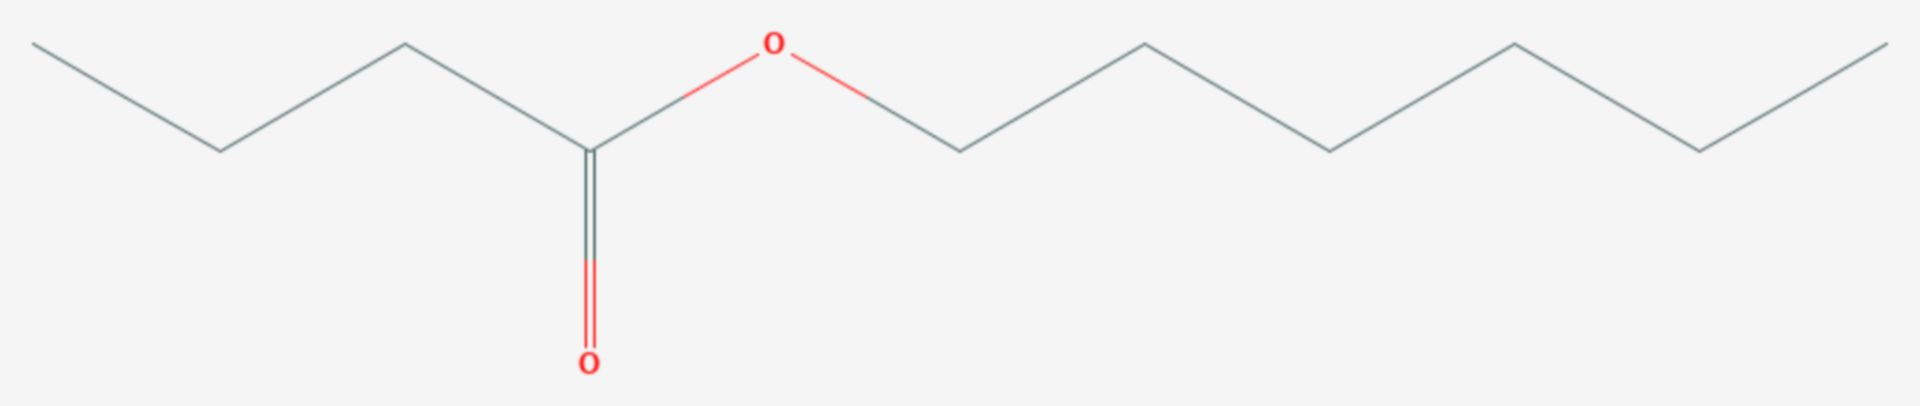 Buttersäurehexylester (Strukturformel)